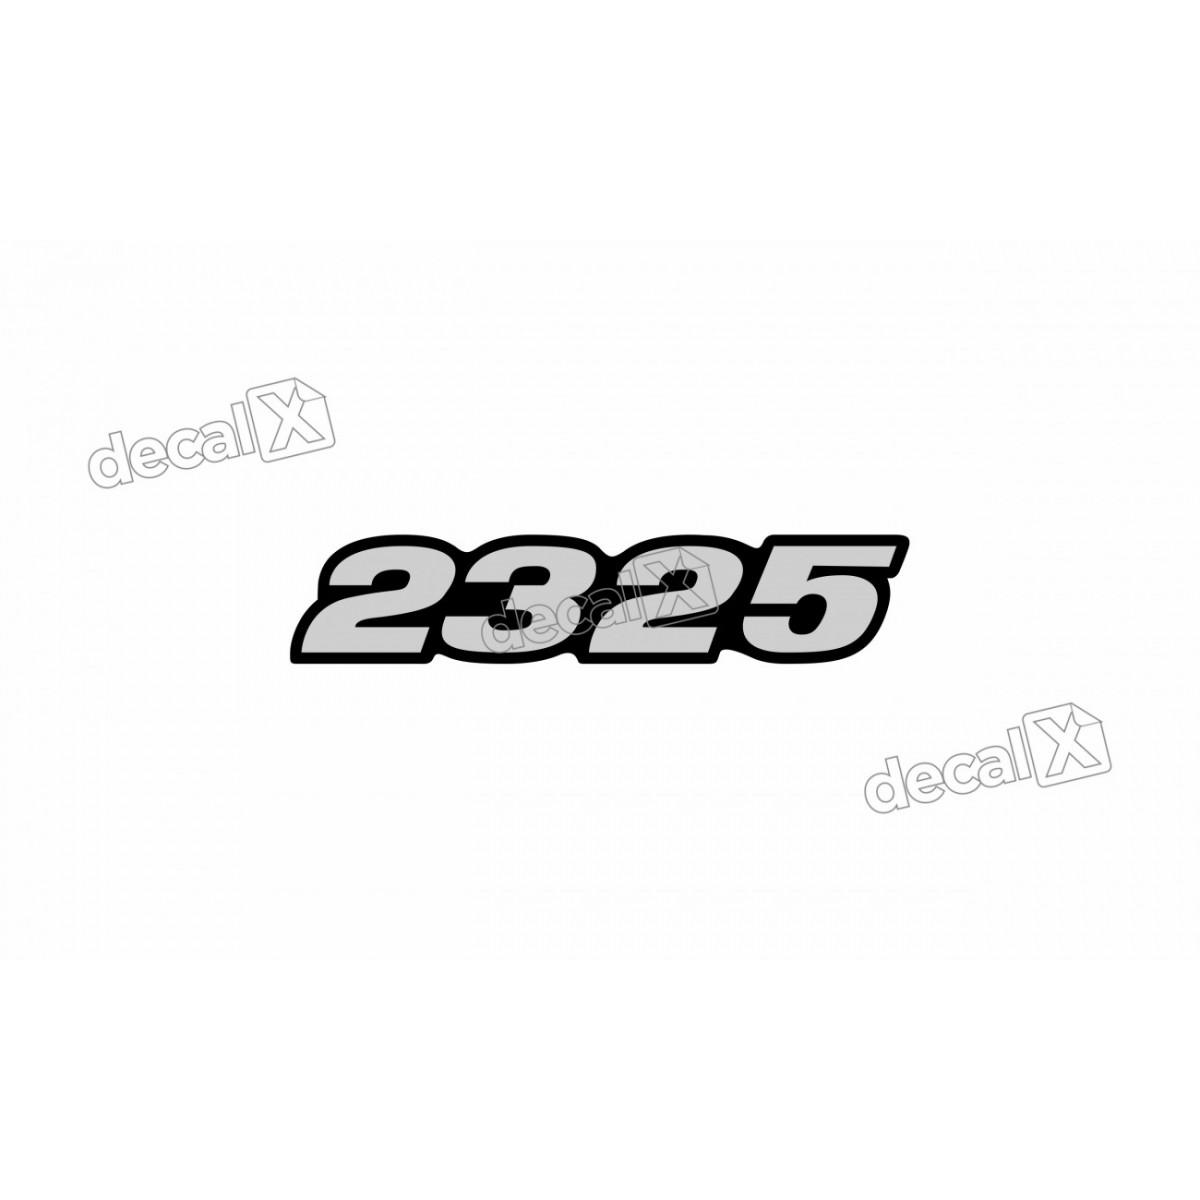 Adesivo Emblema Resinado Mercedes 2325 Cm84 Decalx